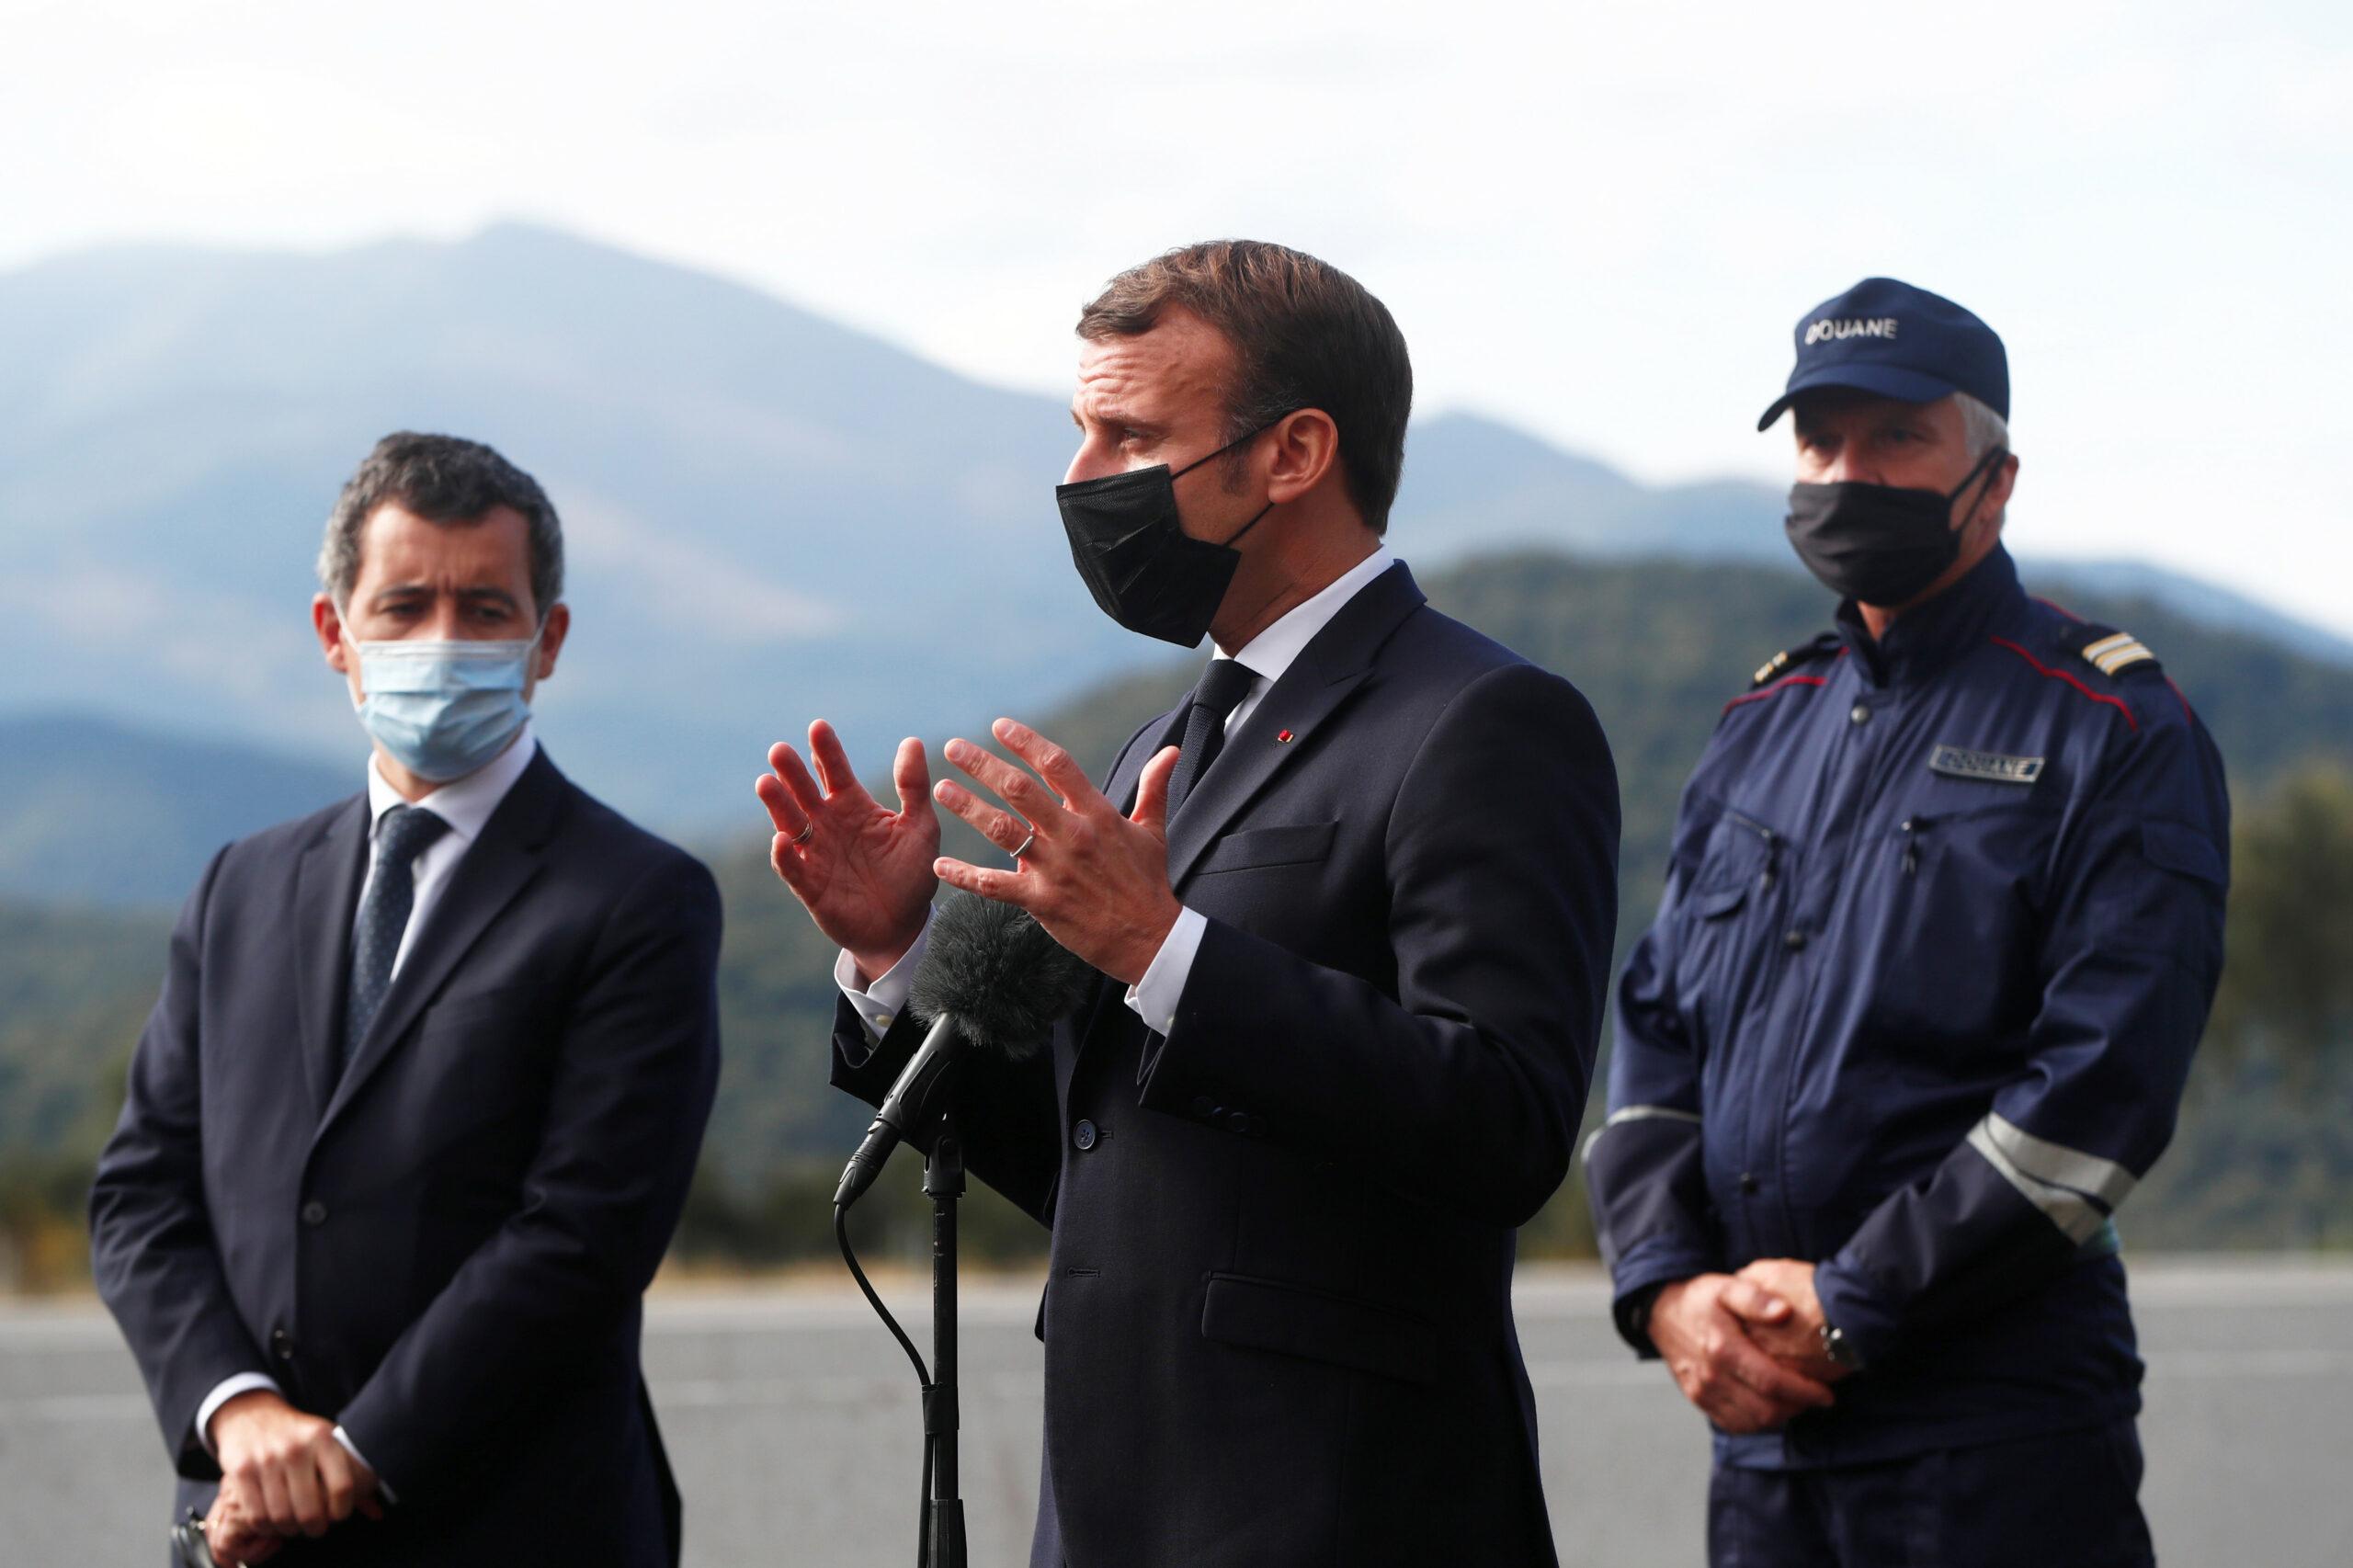 El president francès, Emmanuel Macron